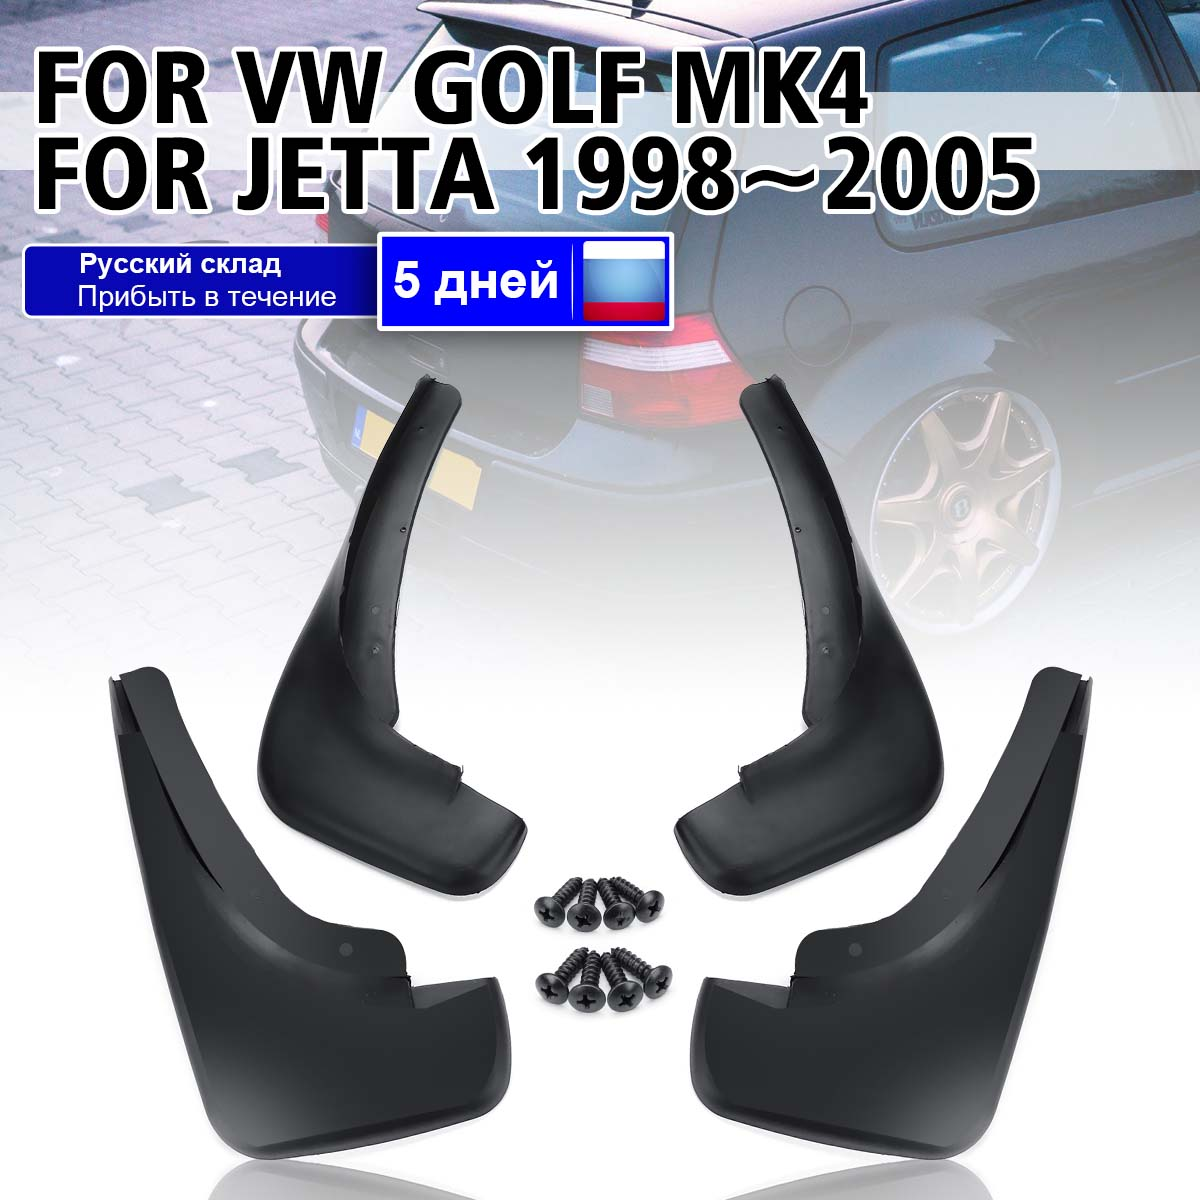 Auto Spatlappen Voor VW Golf 4 Mk4 IV Bora Jetta 1998-2005 Spatlappen Splash Guards Voor Achter Spatbord spatborden